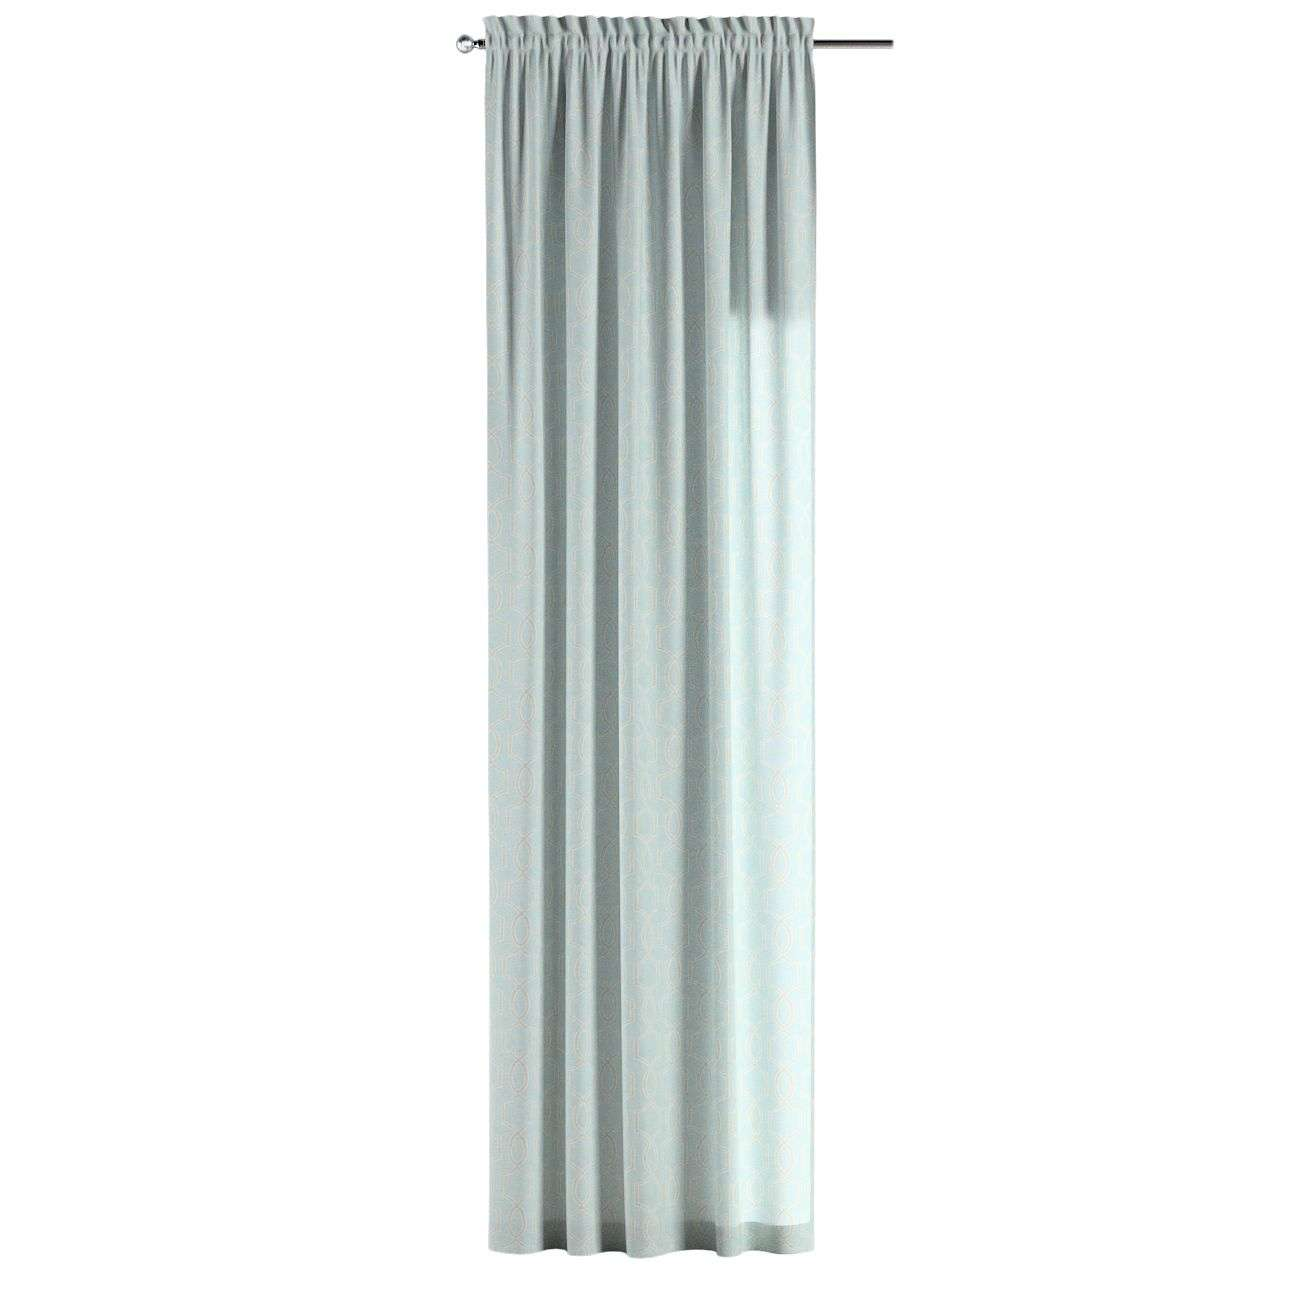 Gardin med løbegang - multibånd 130 × 260 cm fra kollektionen Comics, Stof: 141-24